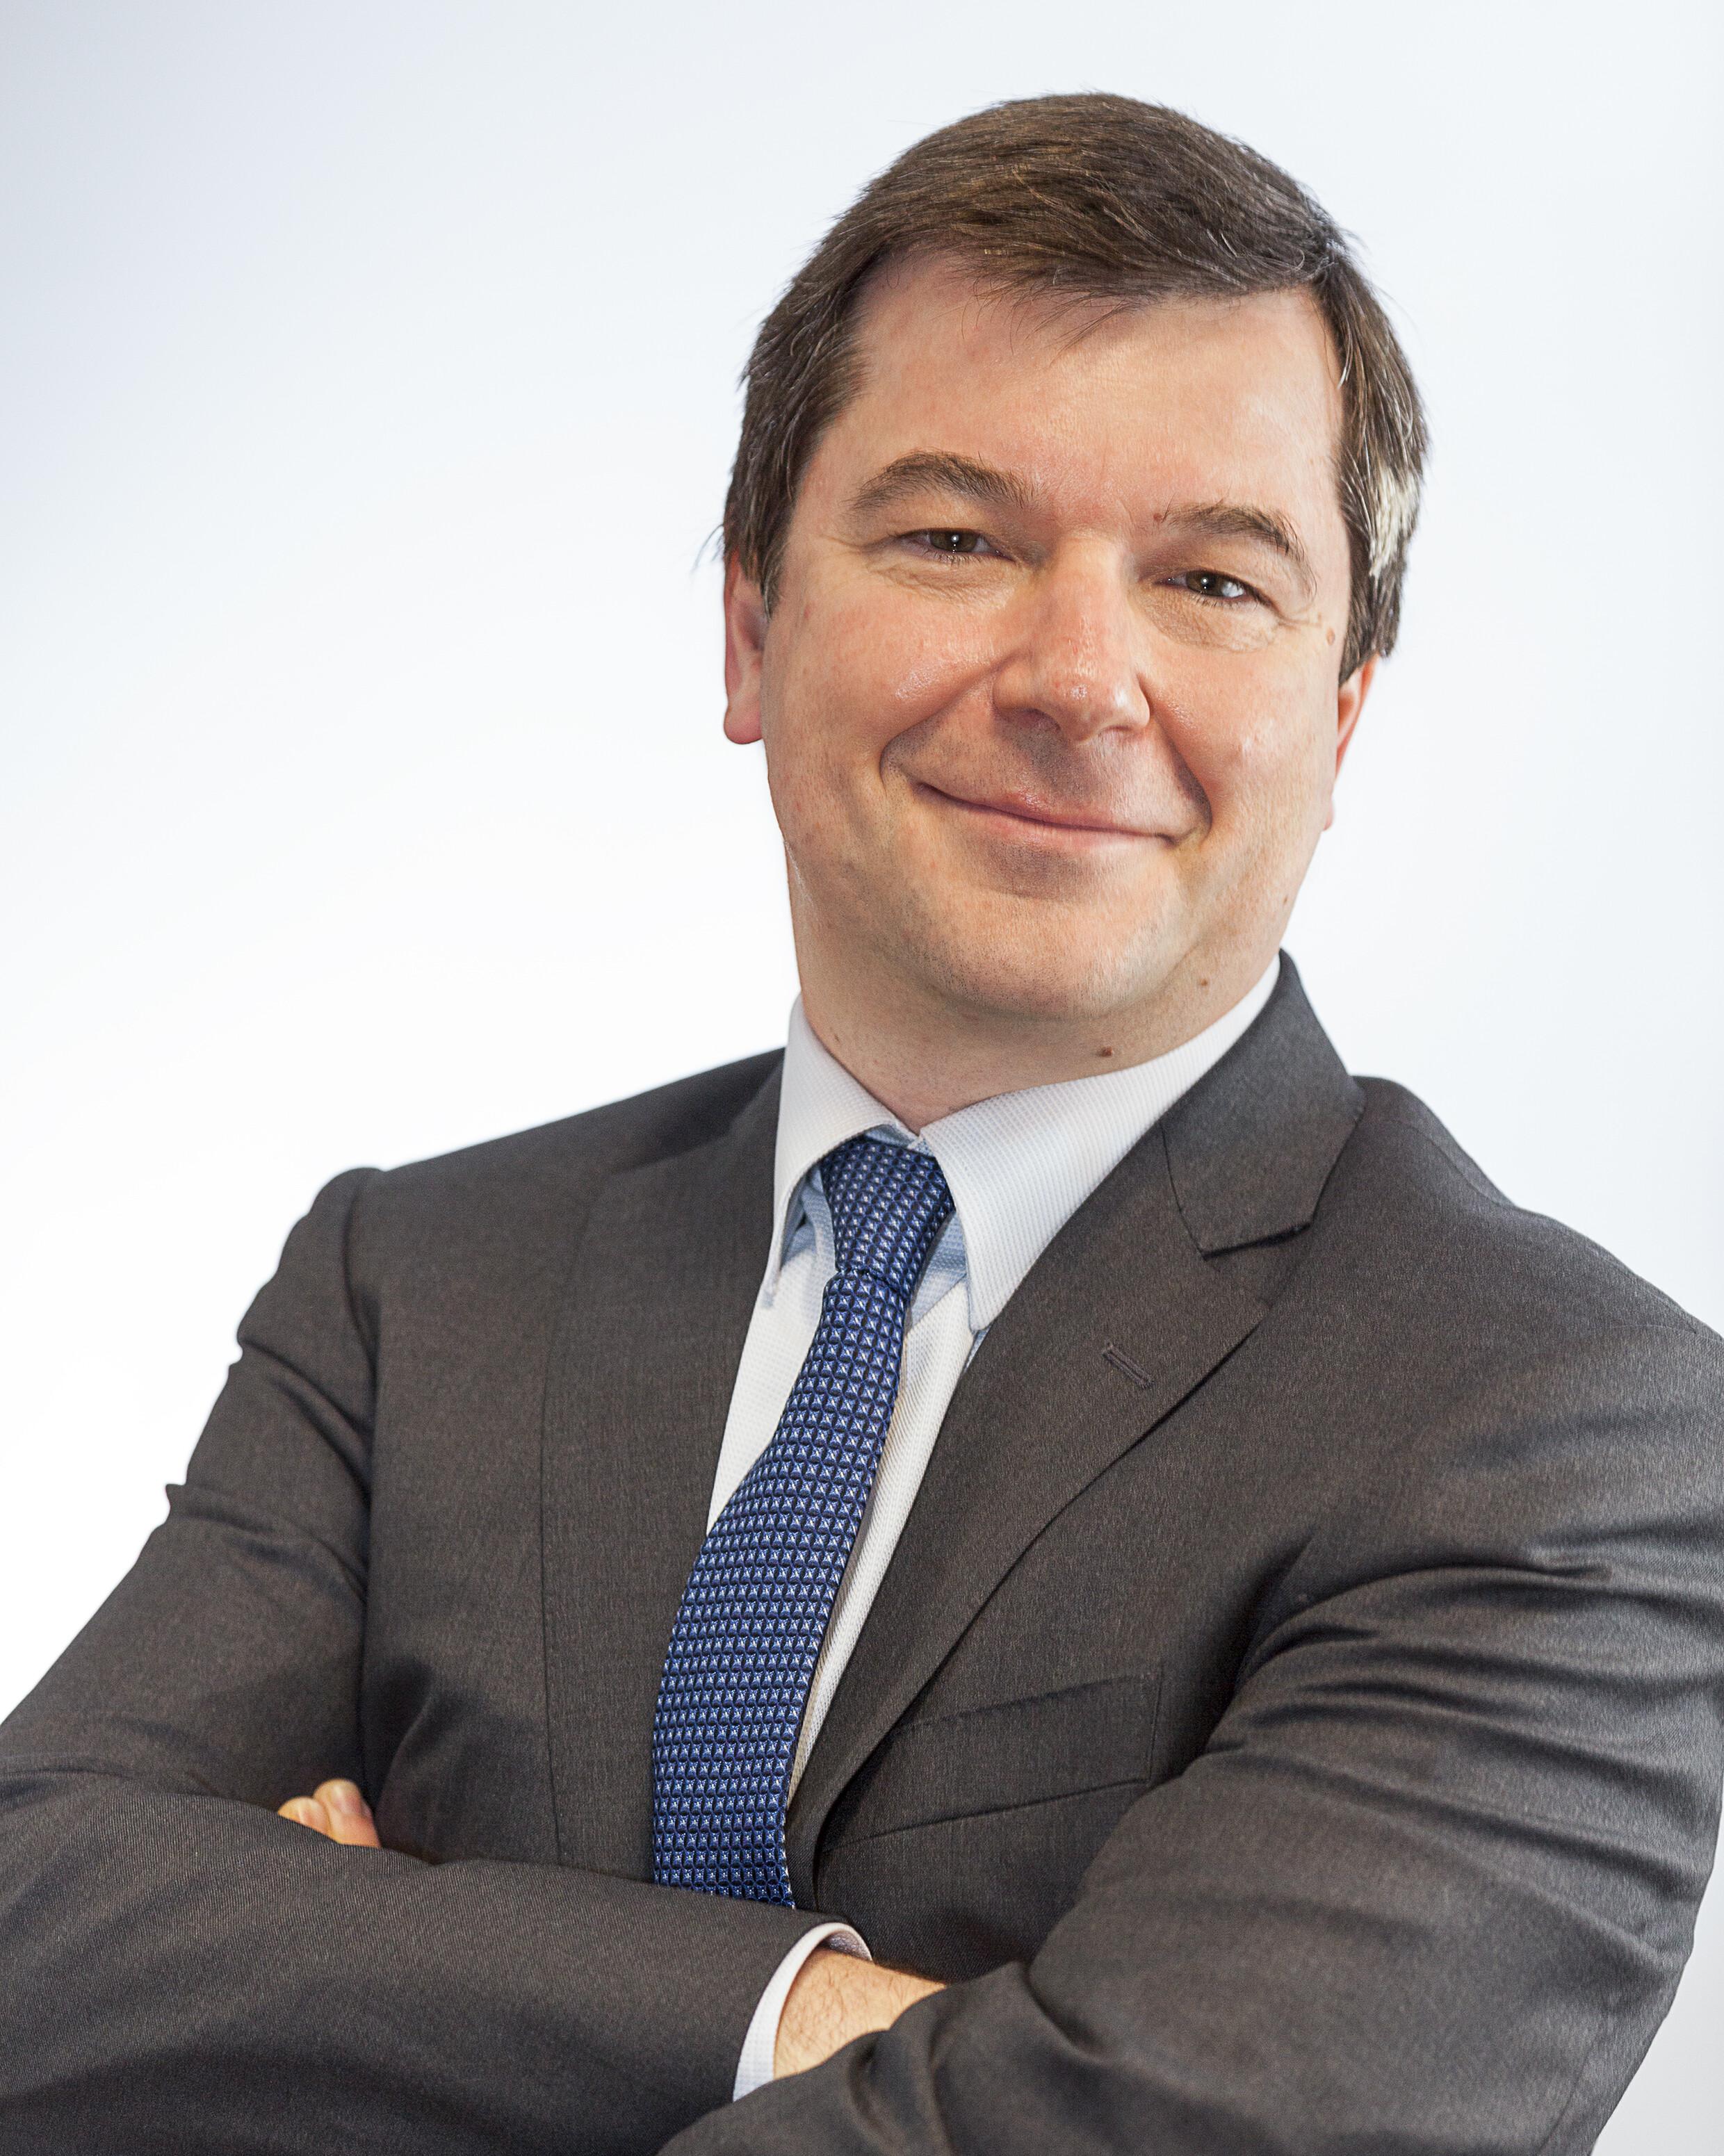 Laurent Musy, CEO der Terreal-Gruppe (Foto: Terreal)